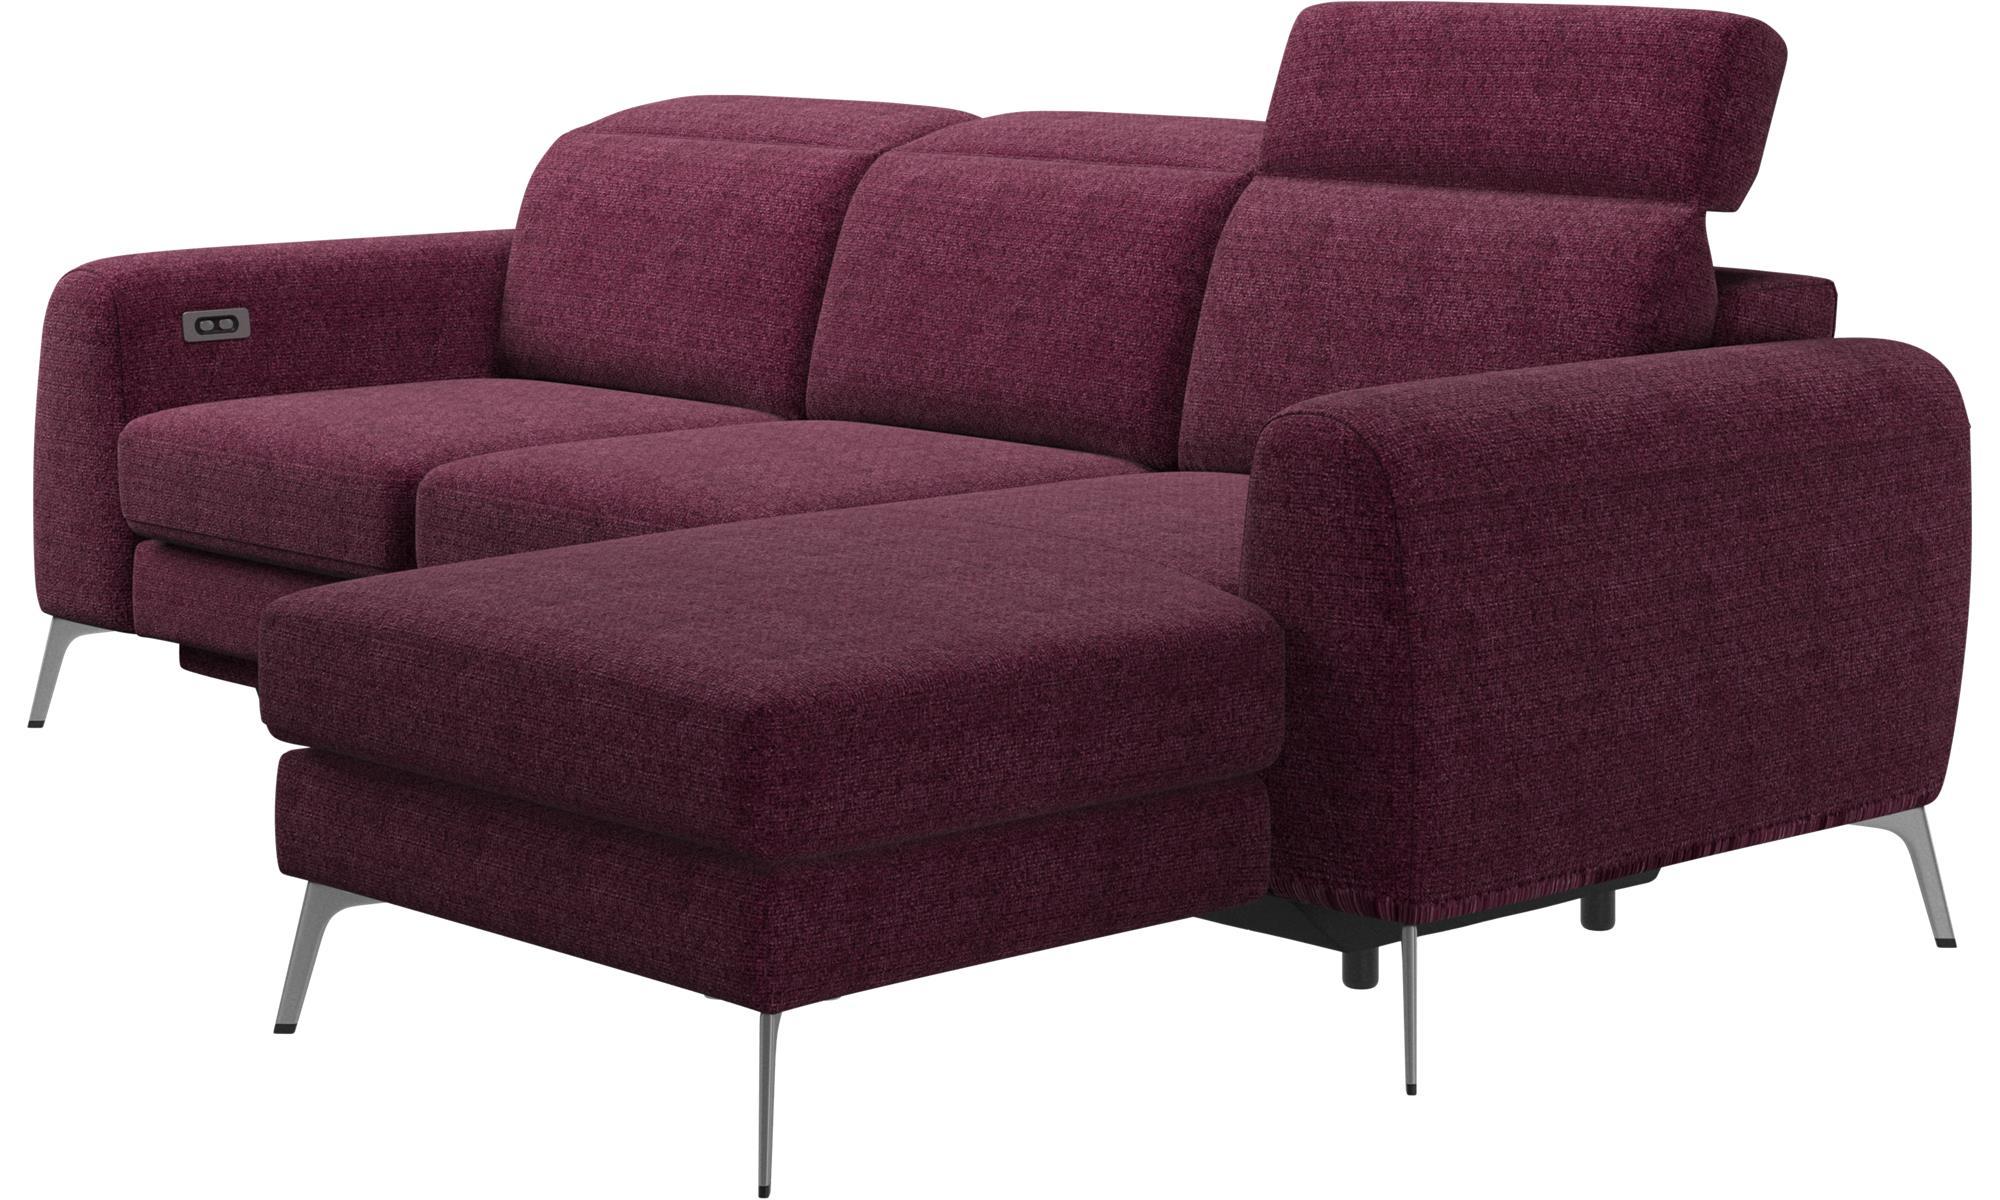 Sof s de 3 plazas sof madison con m dulo chaise longue - Asientos para sofas ...